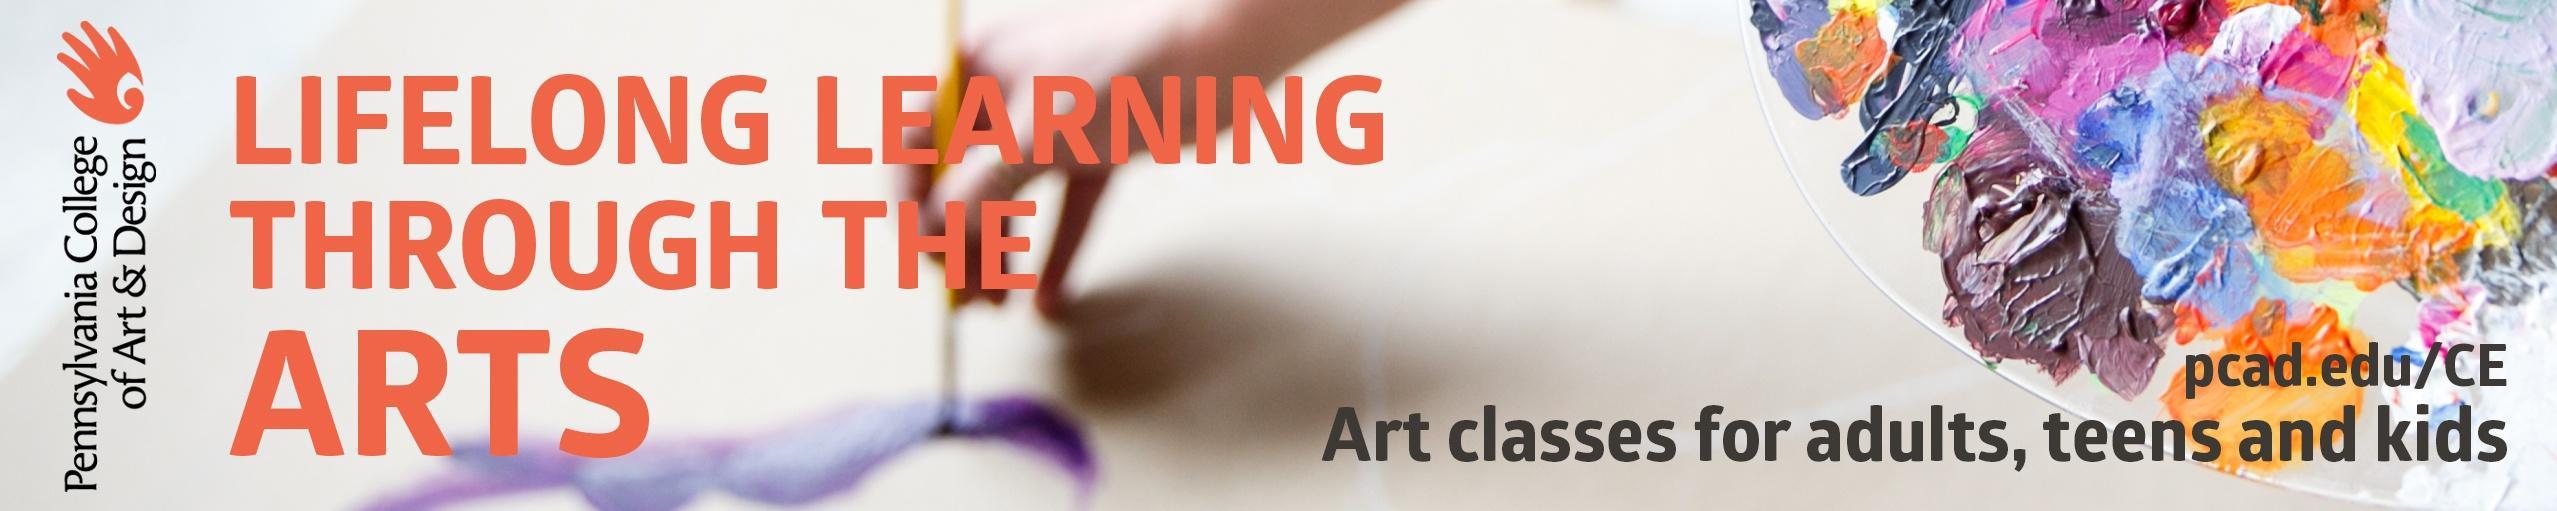 Lifelong Learning at PCA&D